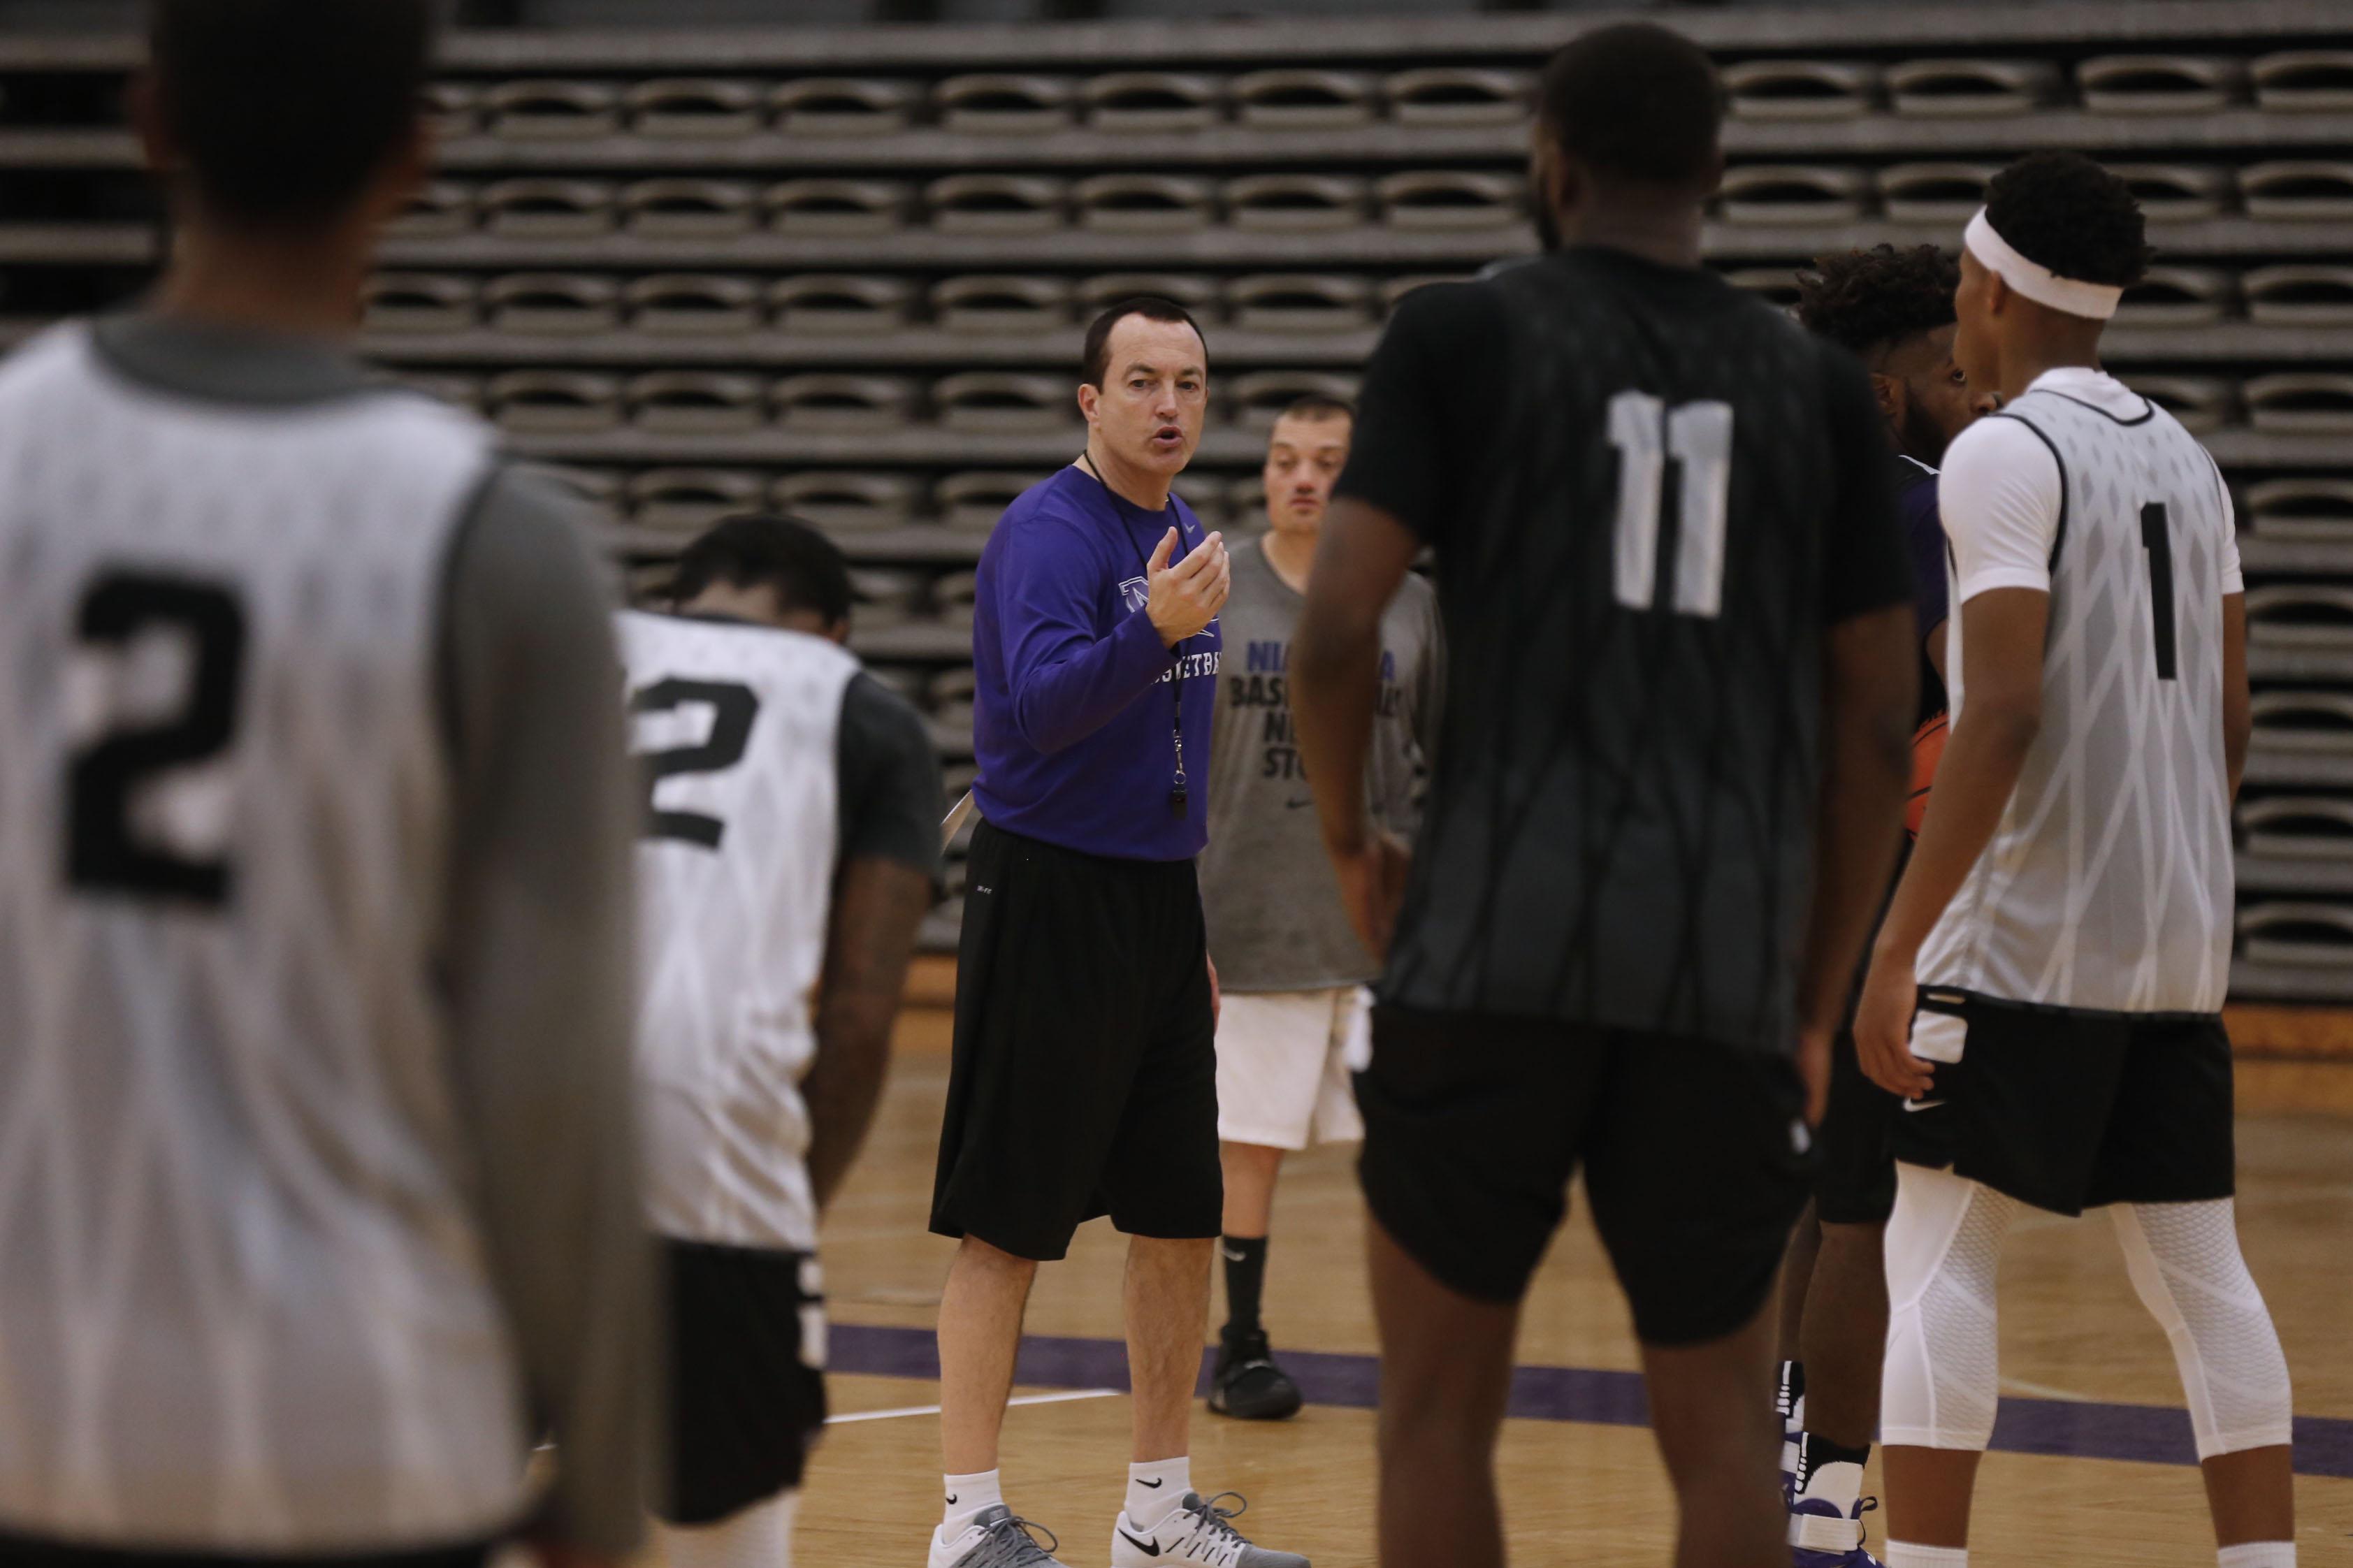 Chris Casey and the Purple Eagles will play 2017 NCAA Tournament team Minnesota this season. (Robert Kirkham/Buffalo News file photo)